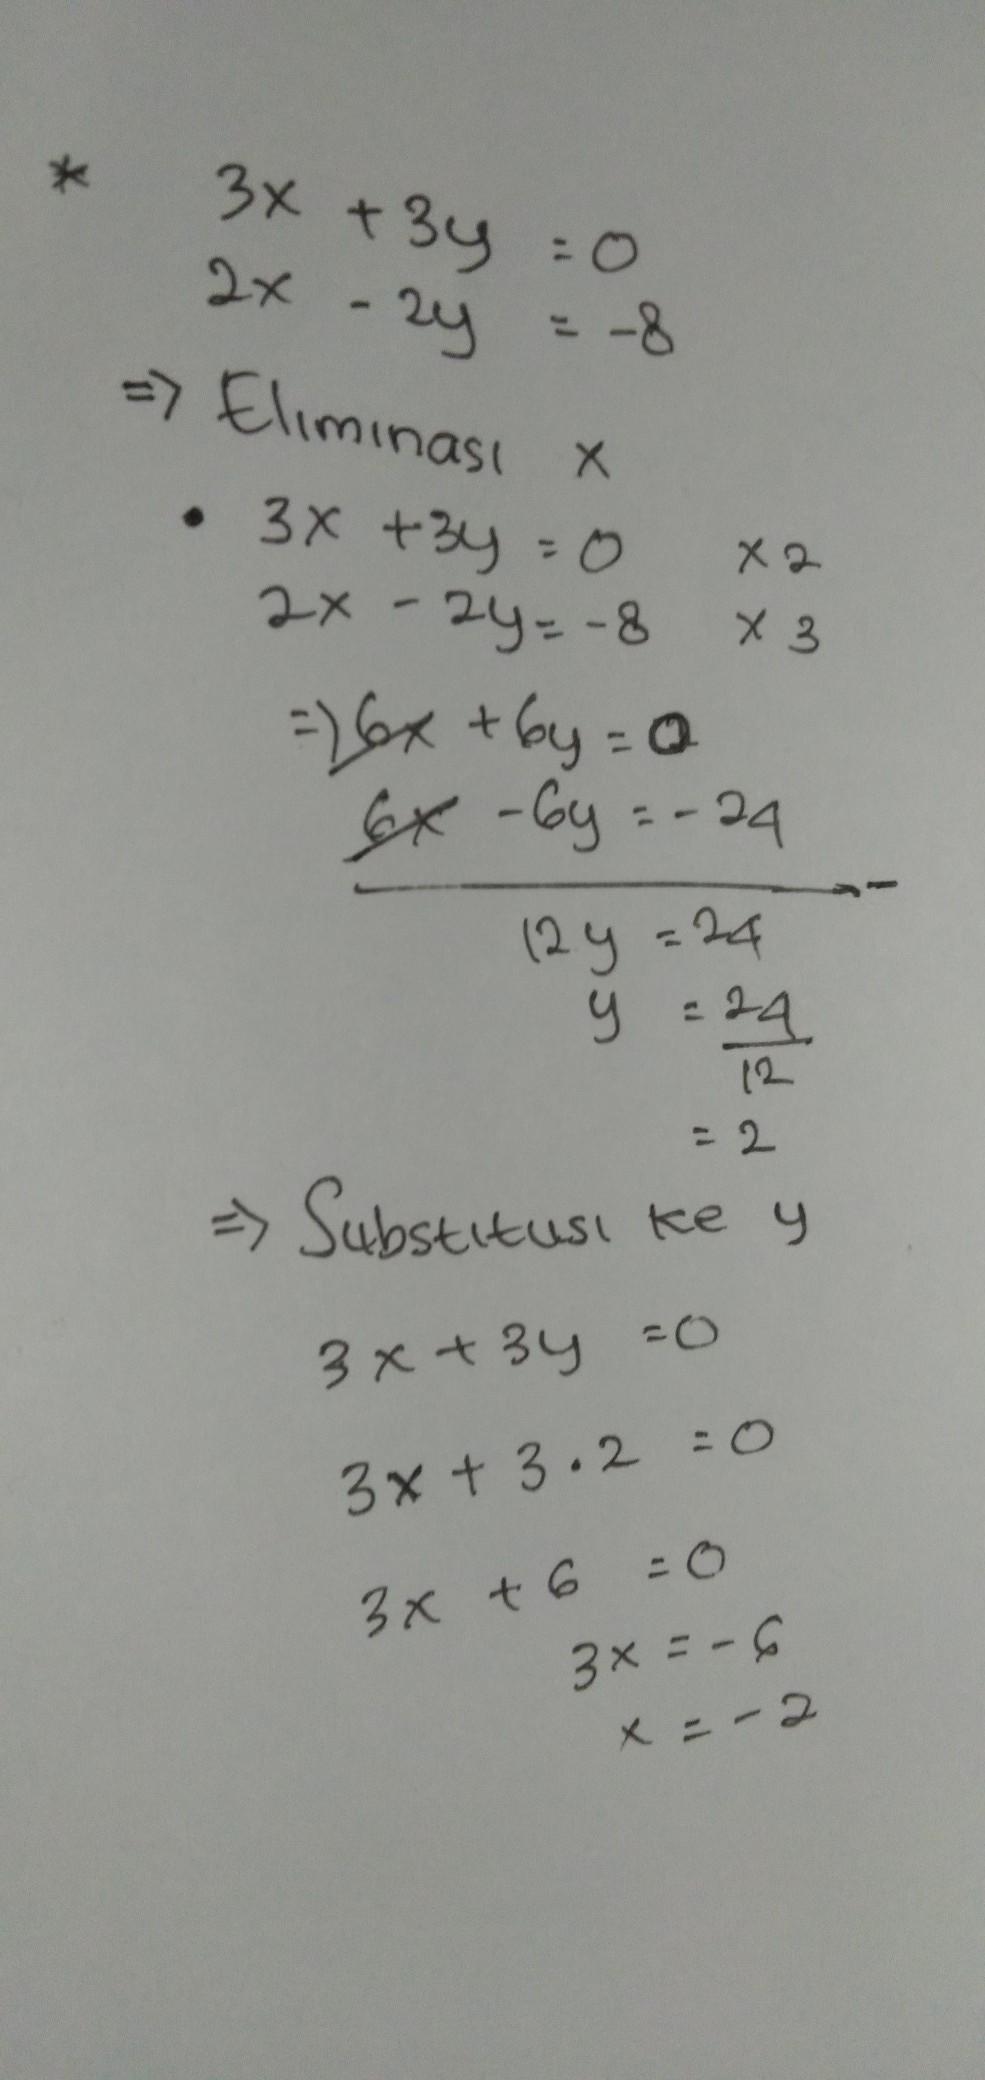 Spldv Metode Subtitusi 3x 3y 0 2x 2y 8 Brainly Co Id